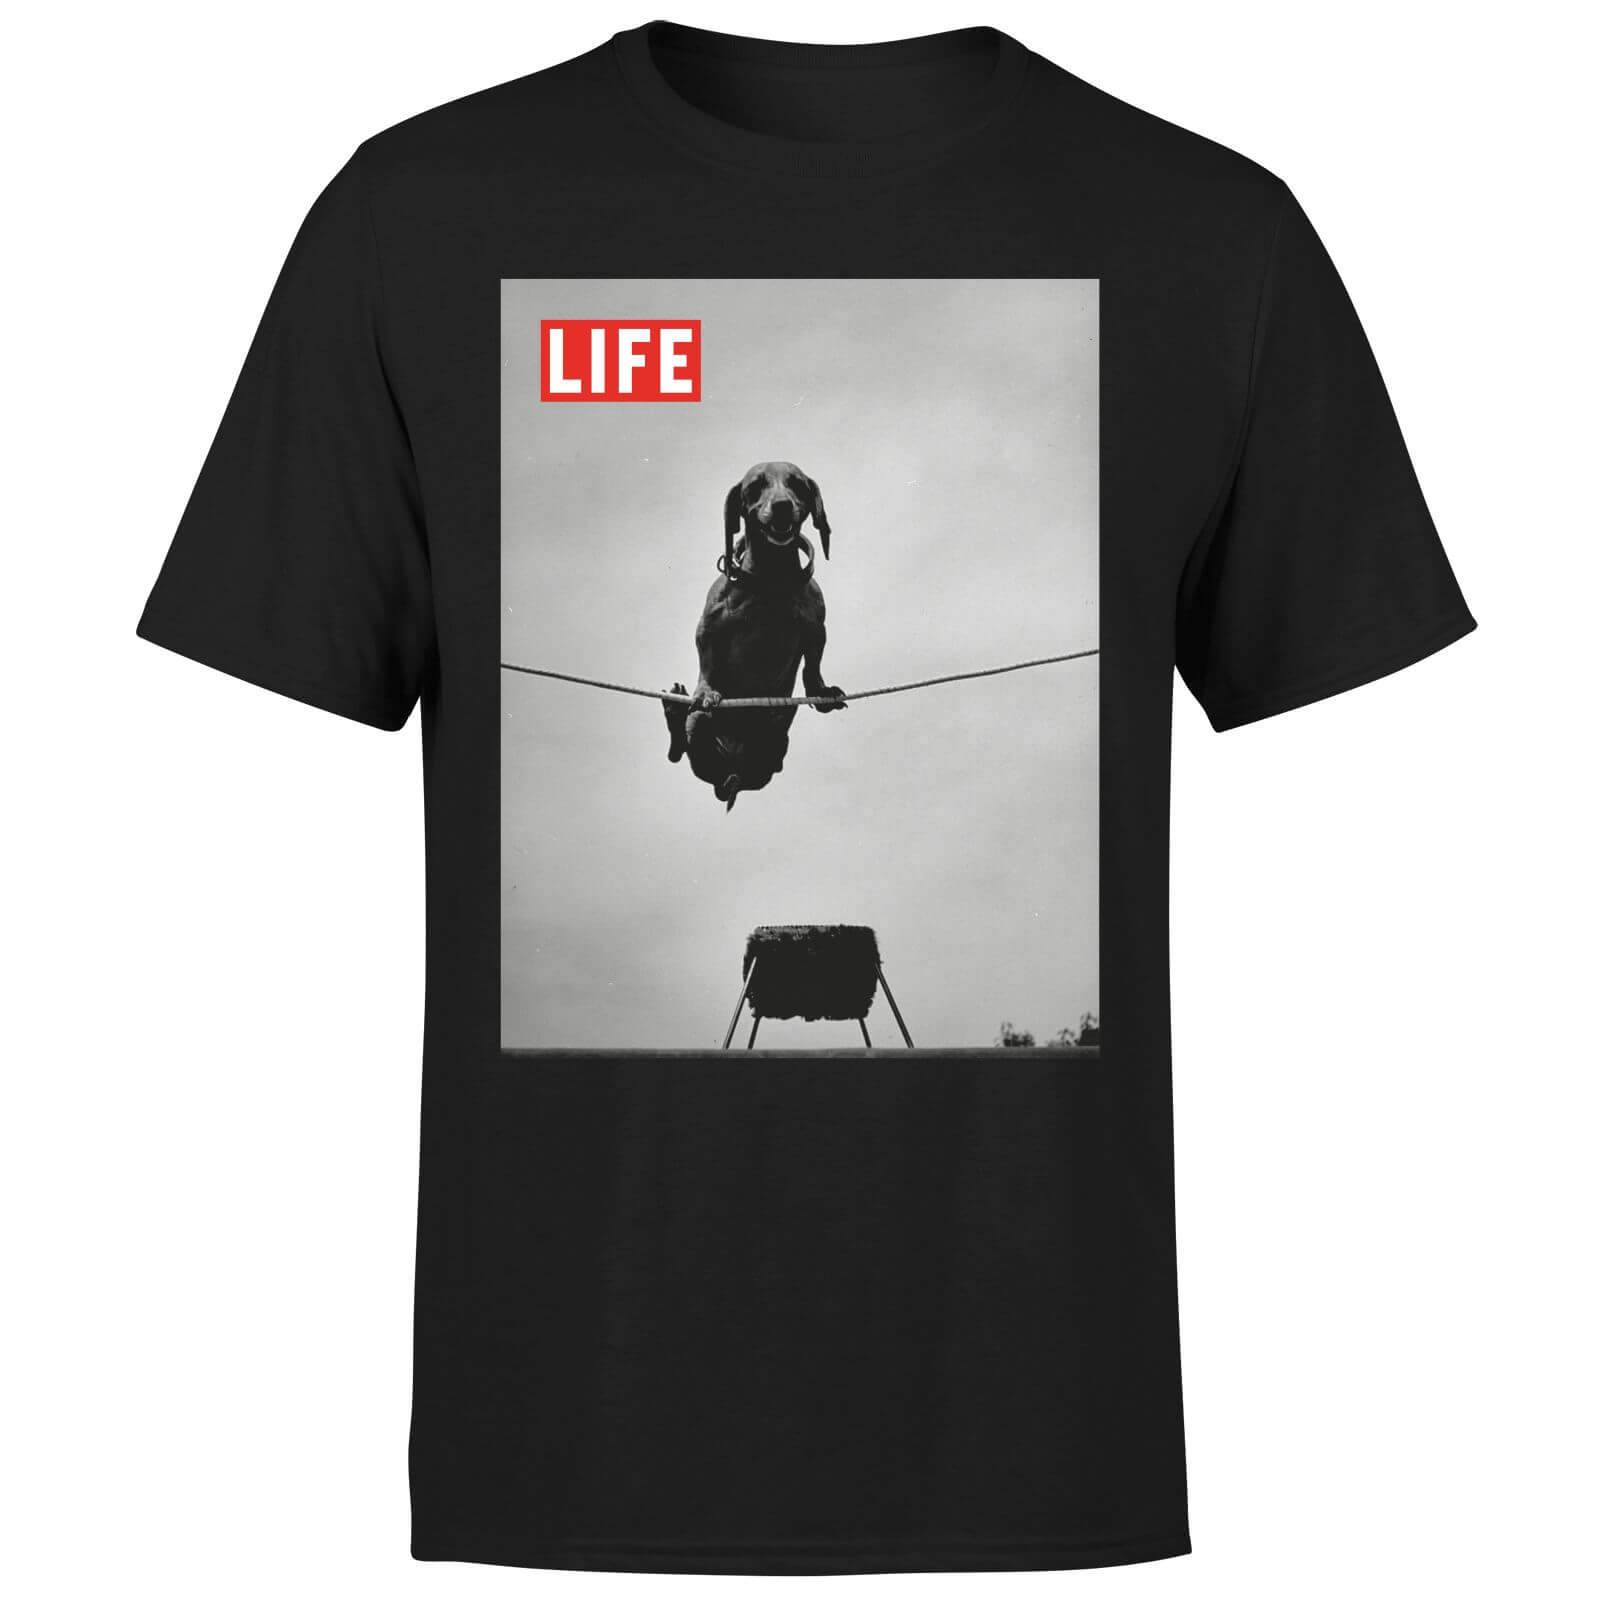 LIFE Magazine Dachshund On A Wire Men's T-Shirt - Black - XL - Black-male